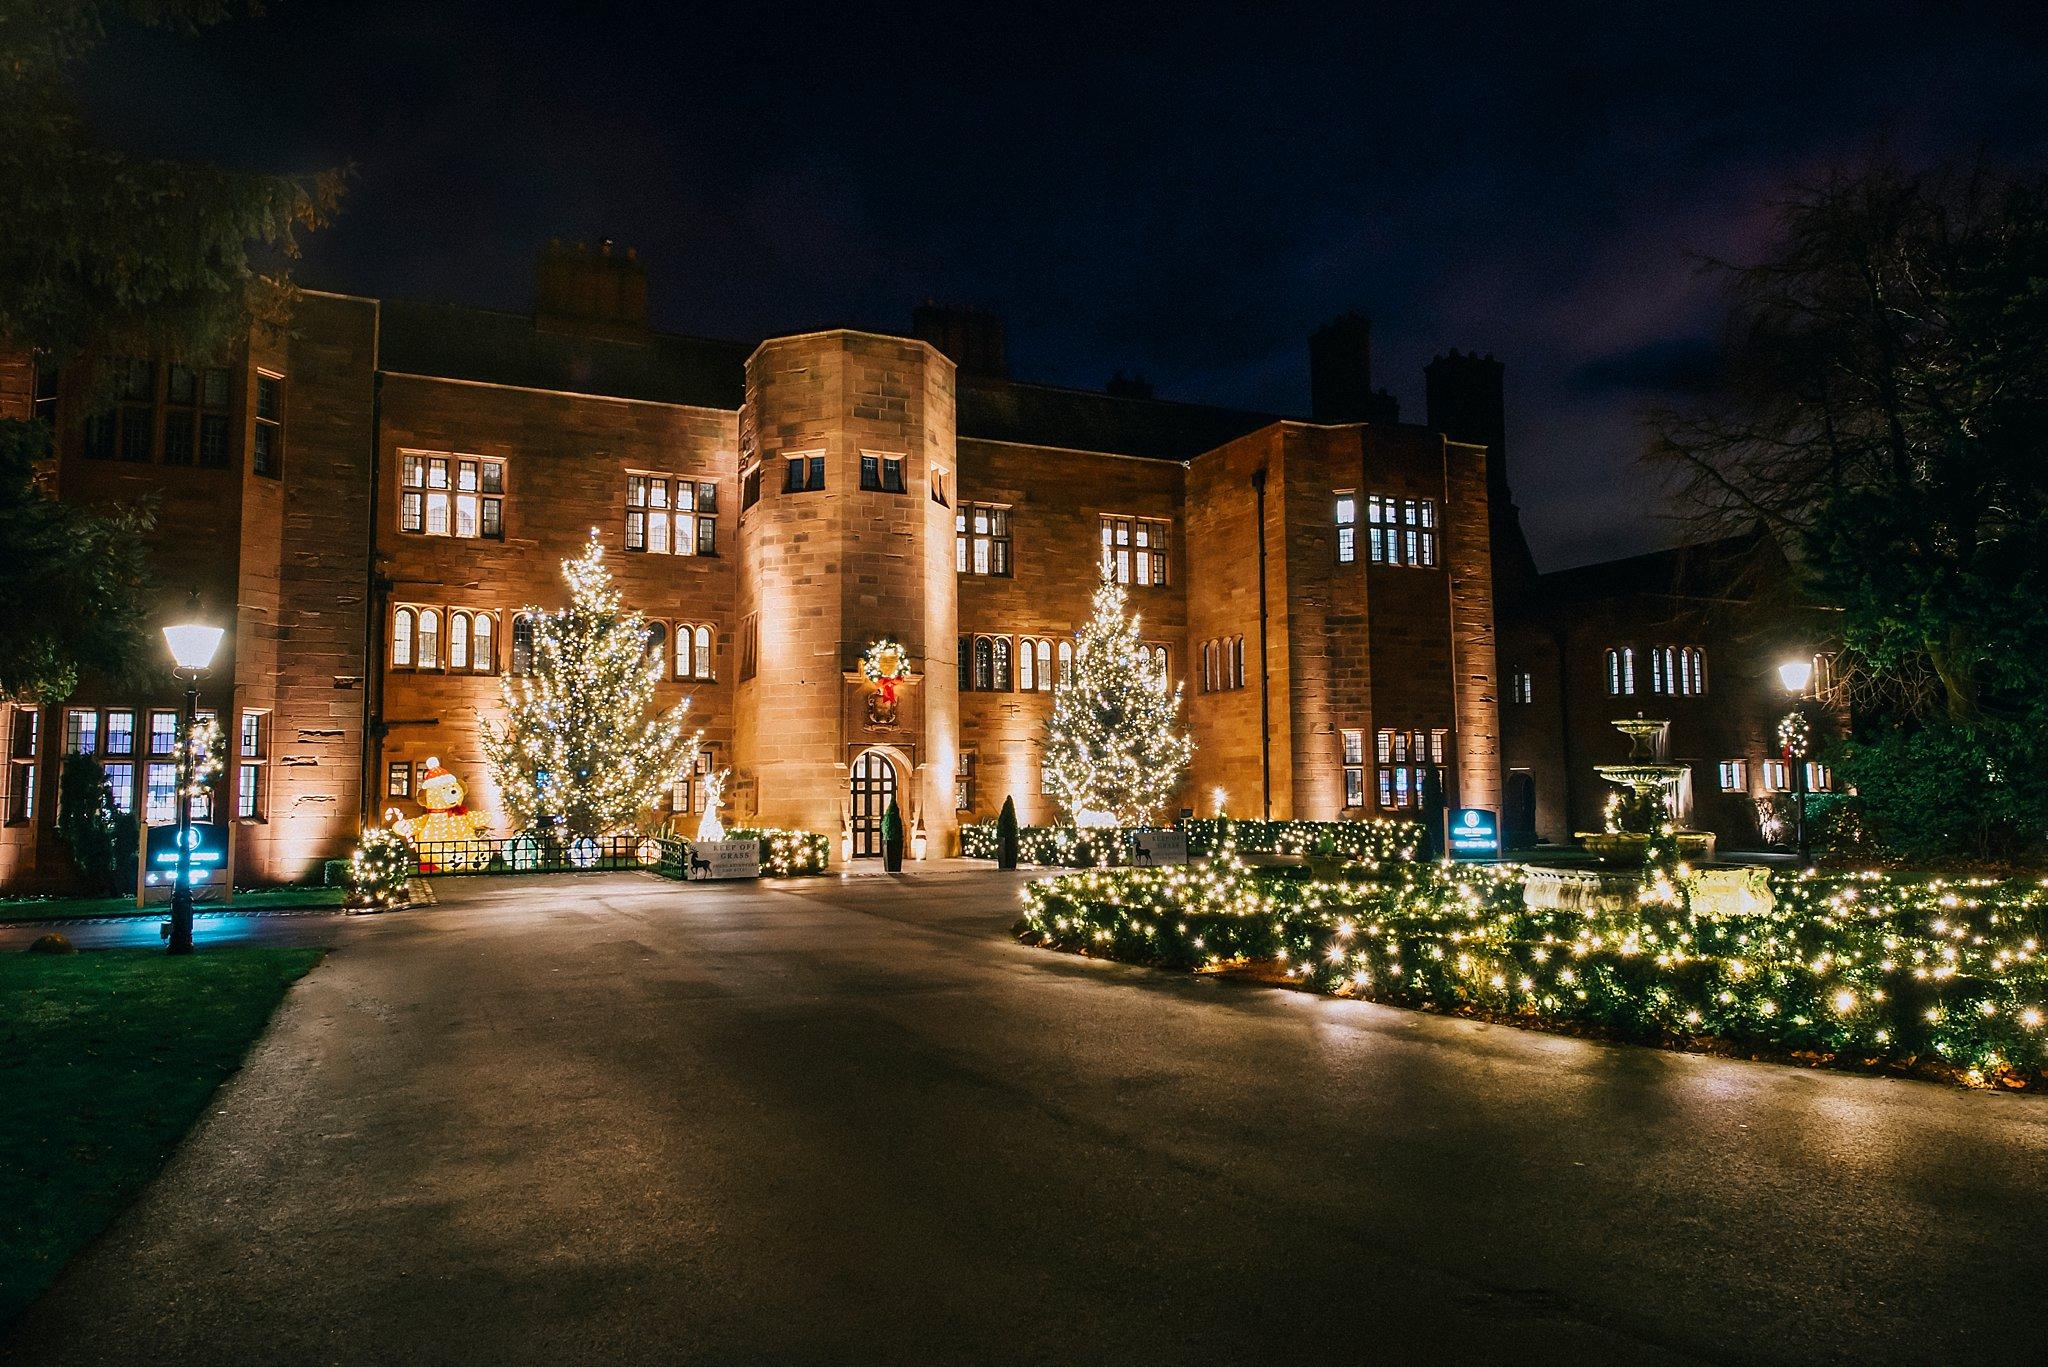 Abbey house hotel Christmas lights